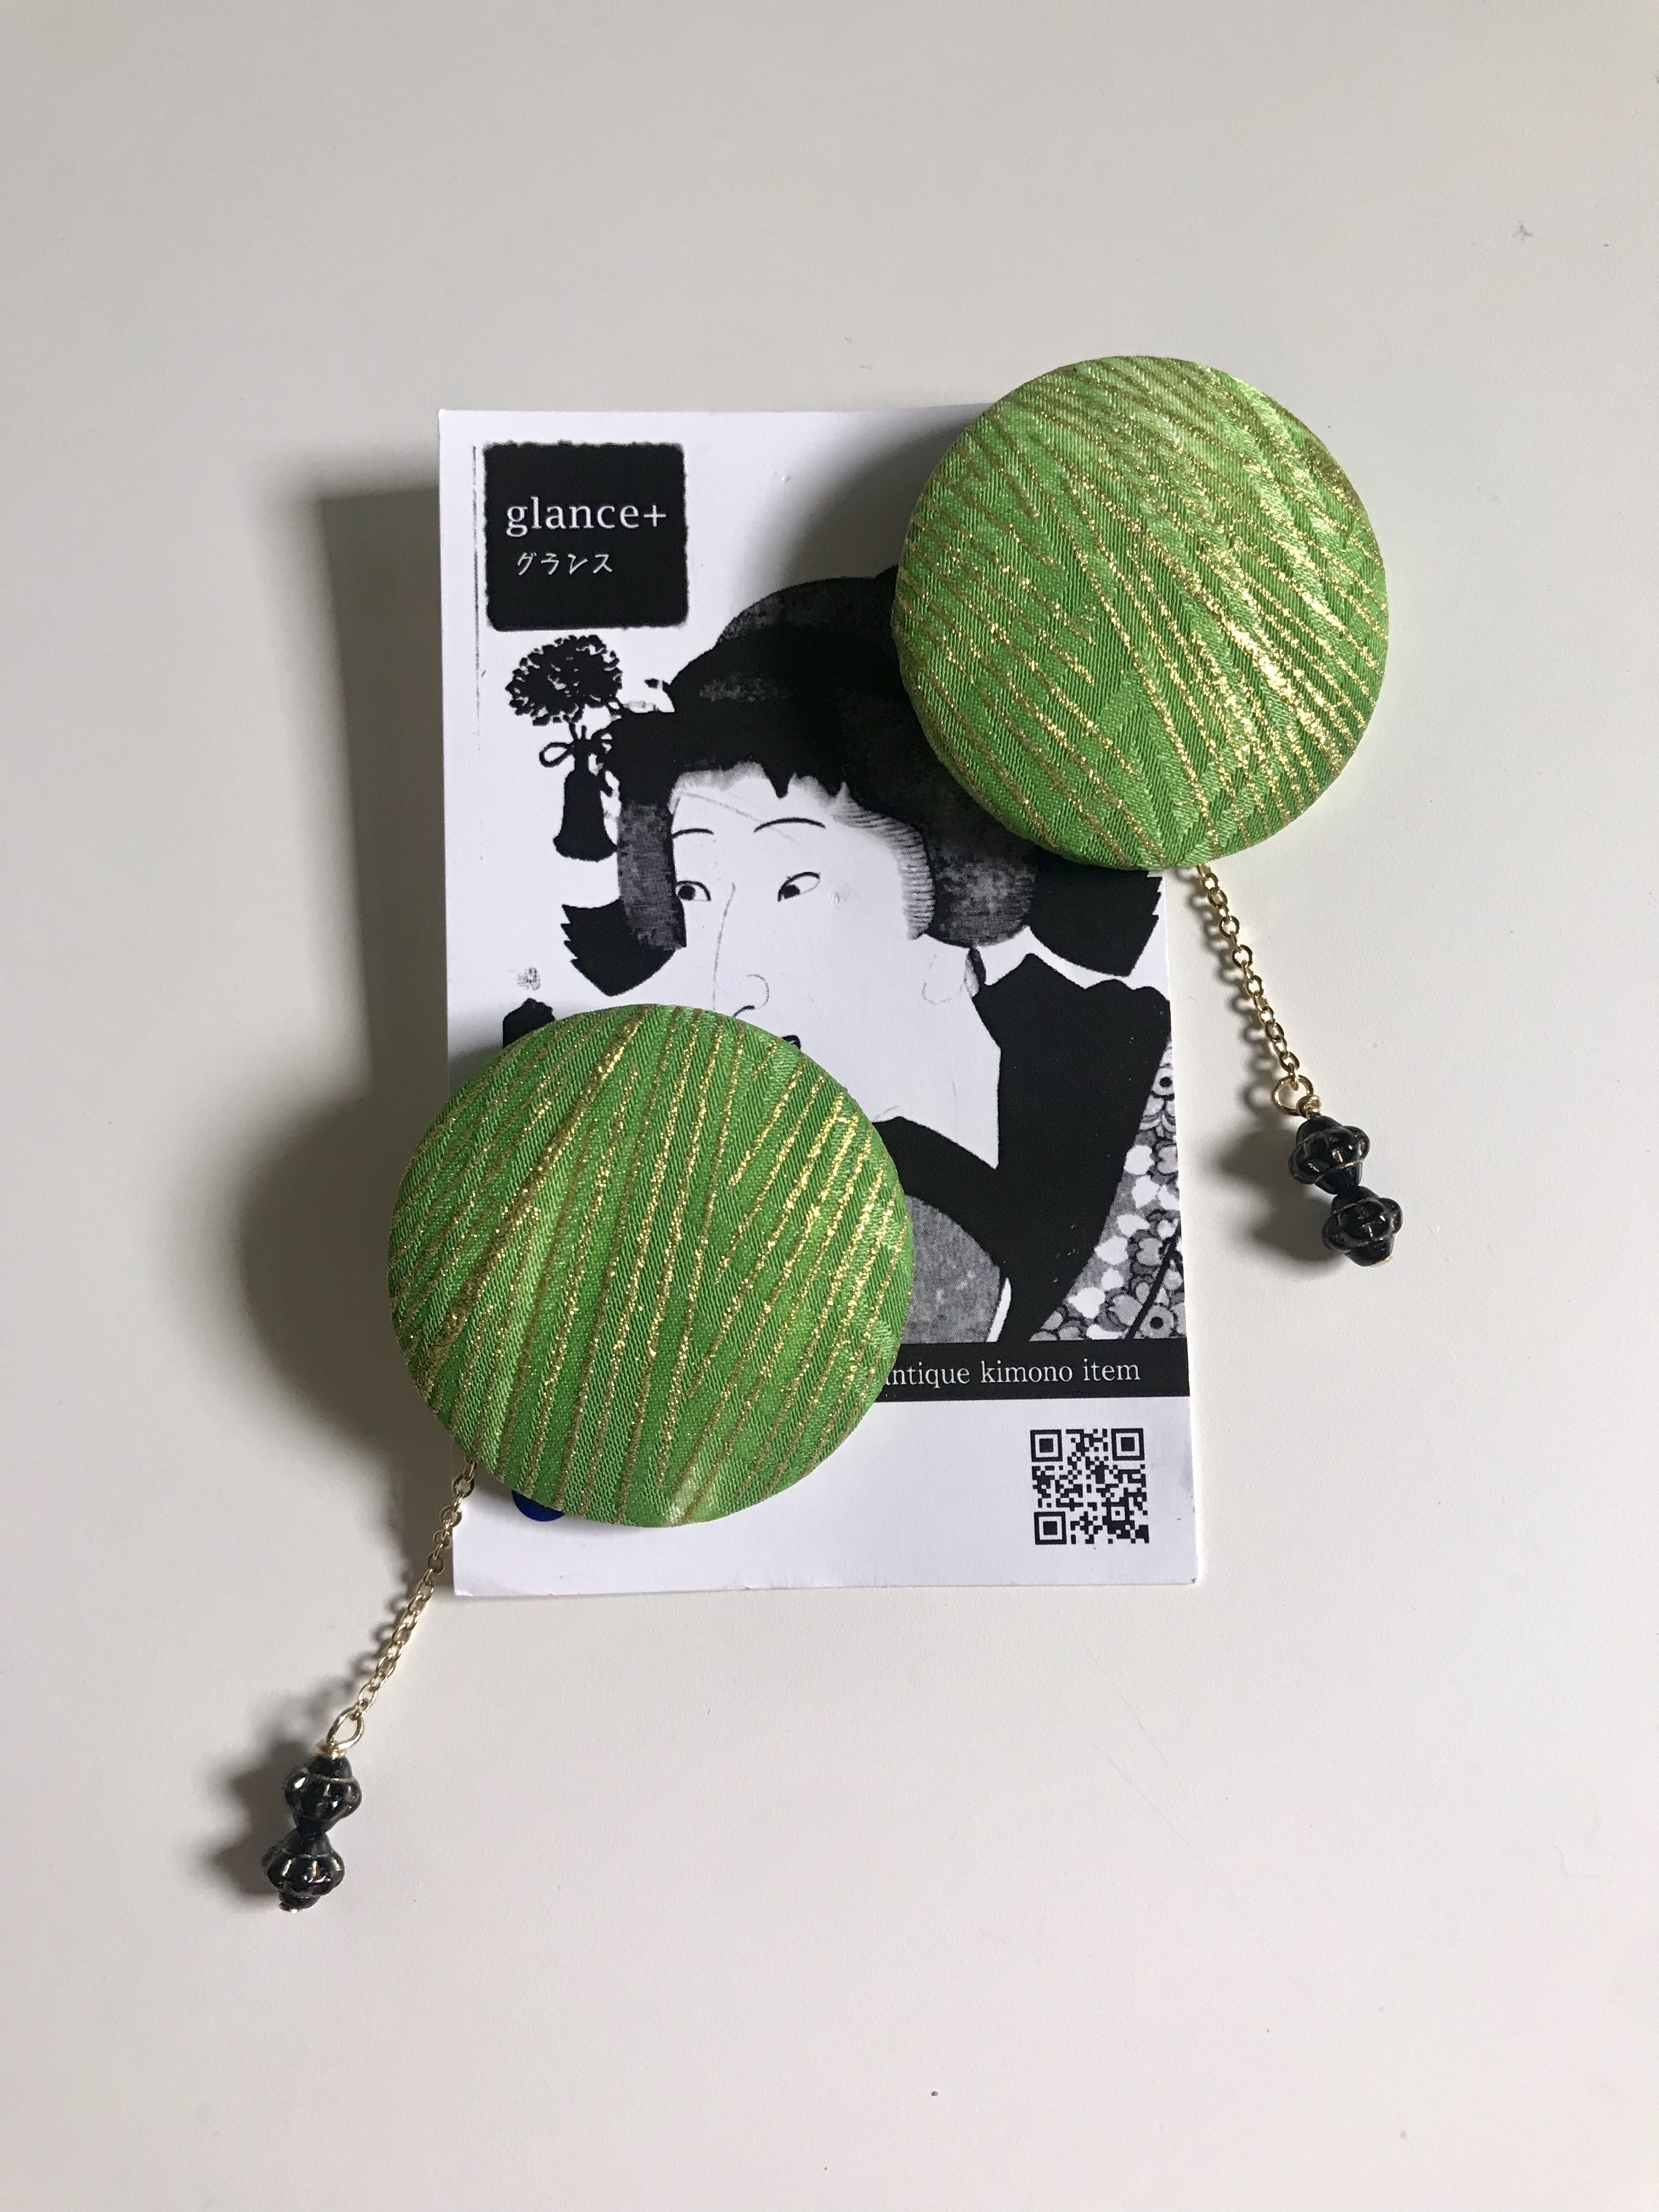 glance +  着物ピアス(ヴィンテージ七五三着物・黄緑)-1